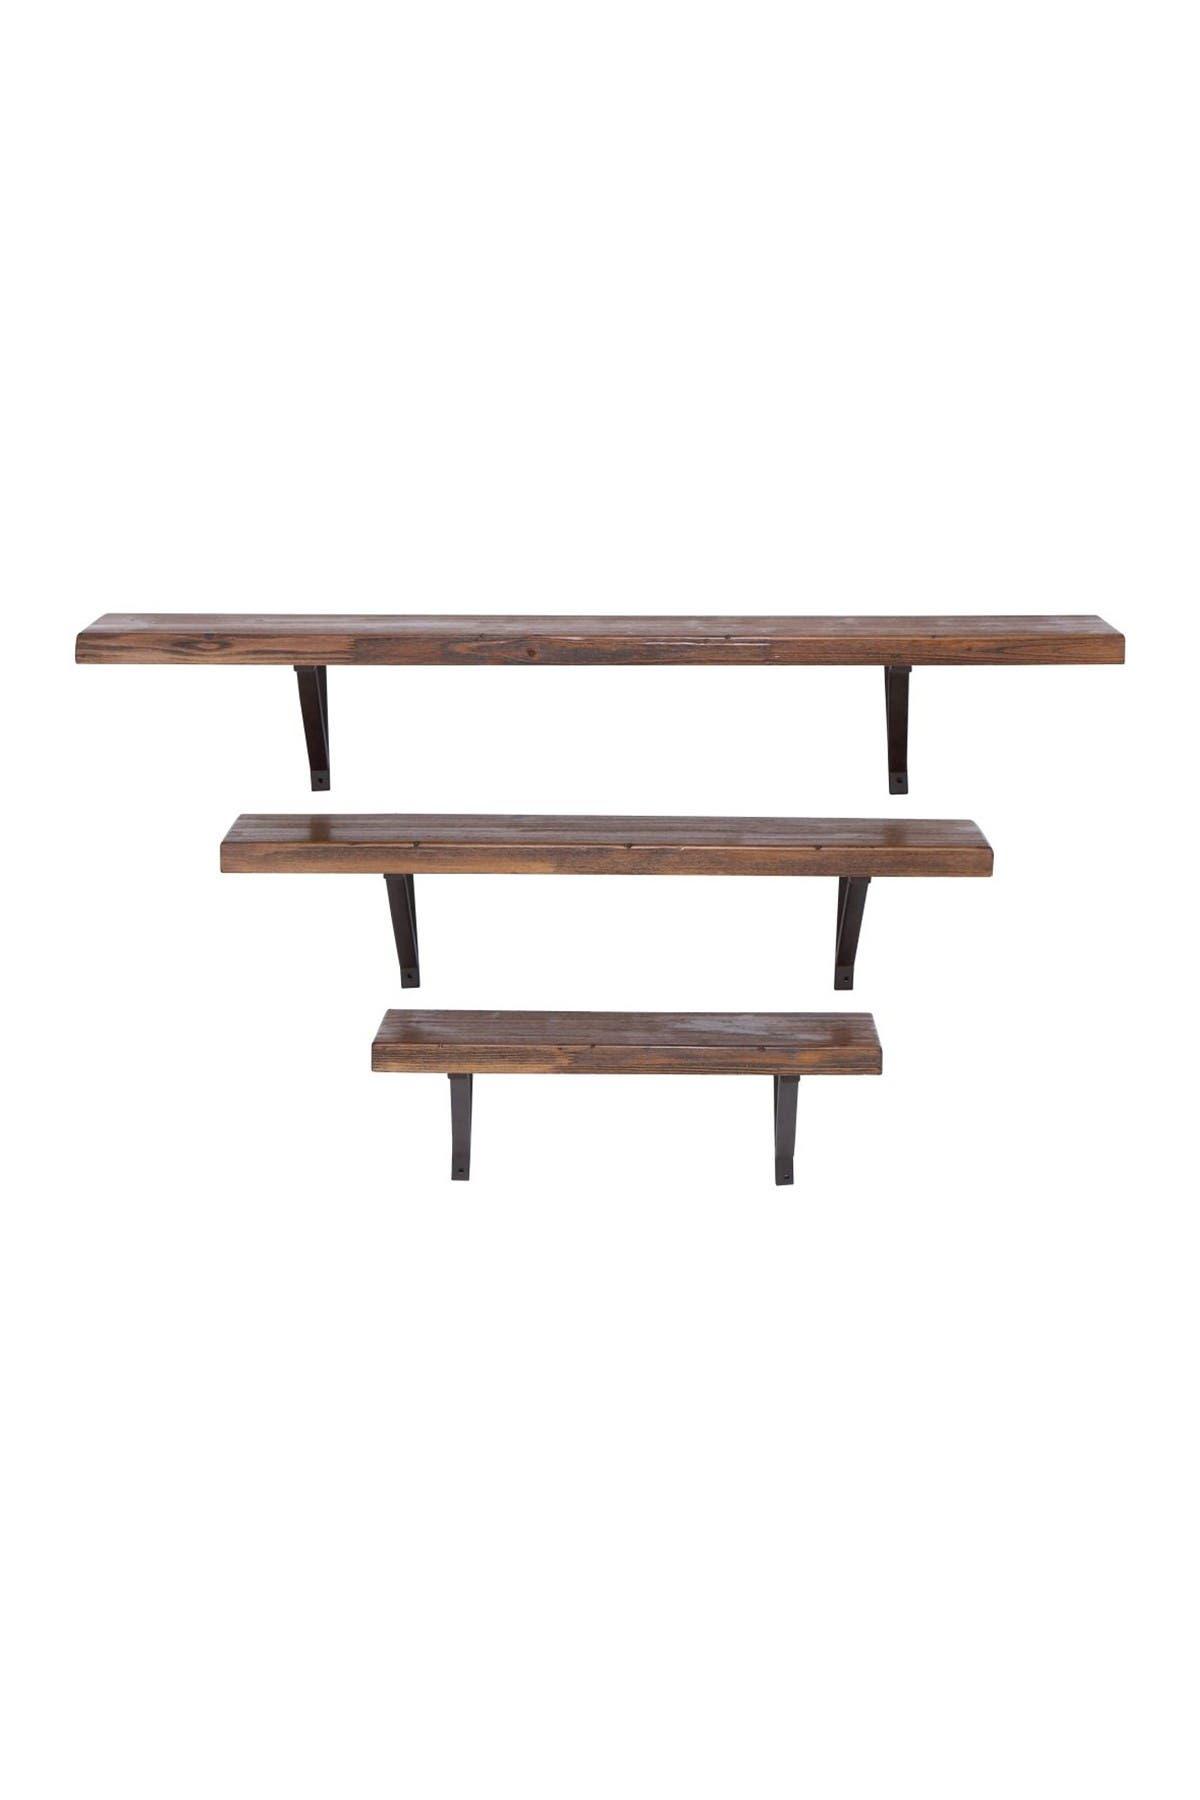 Image of Willow Row Brown Modern Wood & Metal Shelf 3-piece set